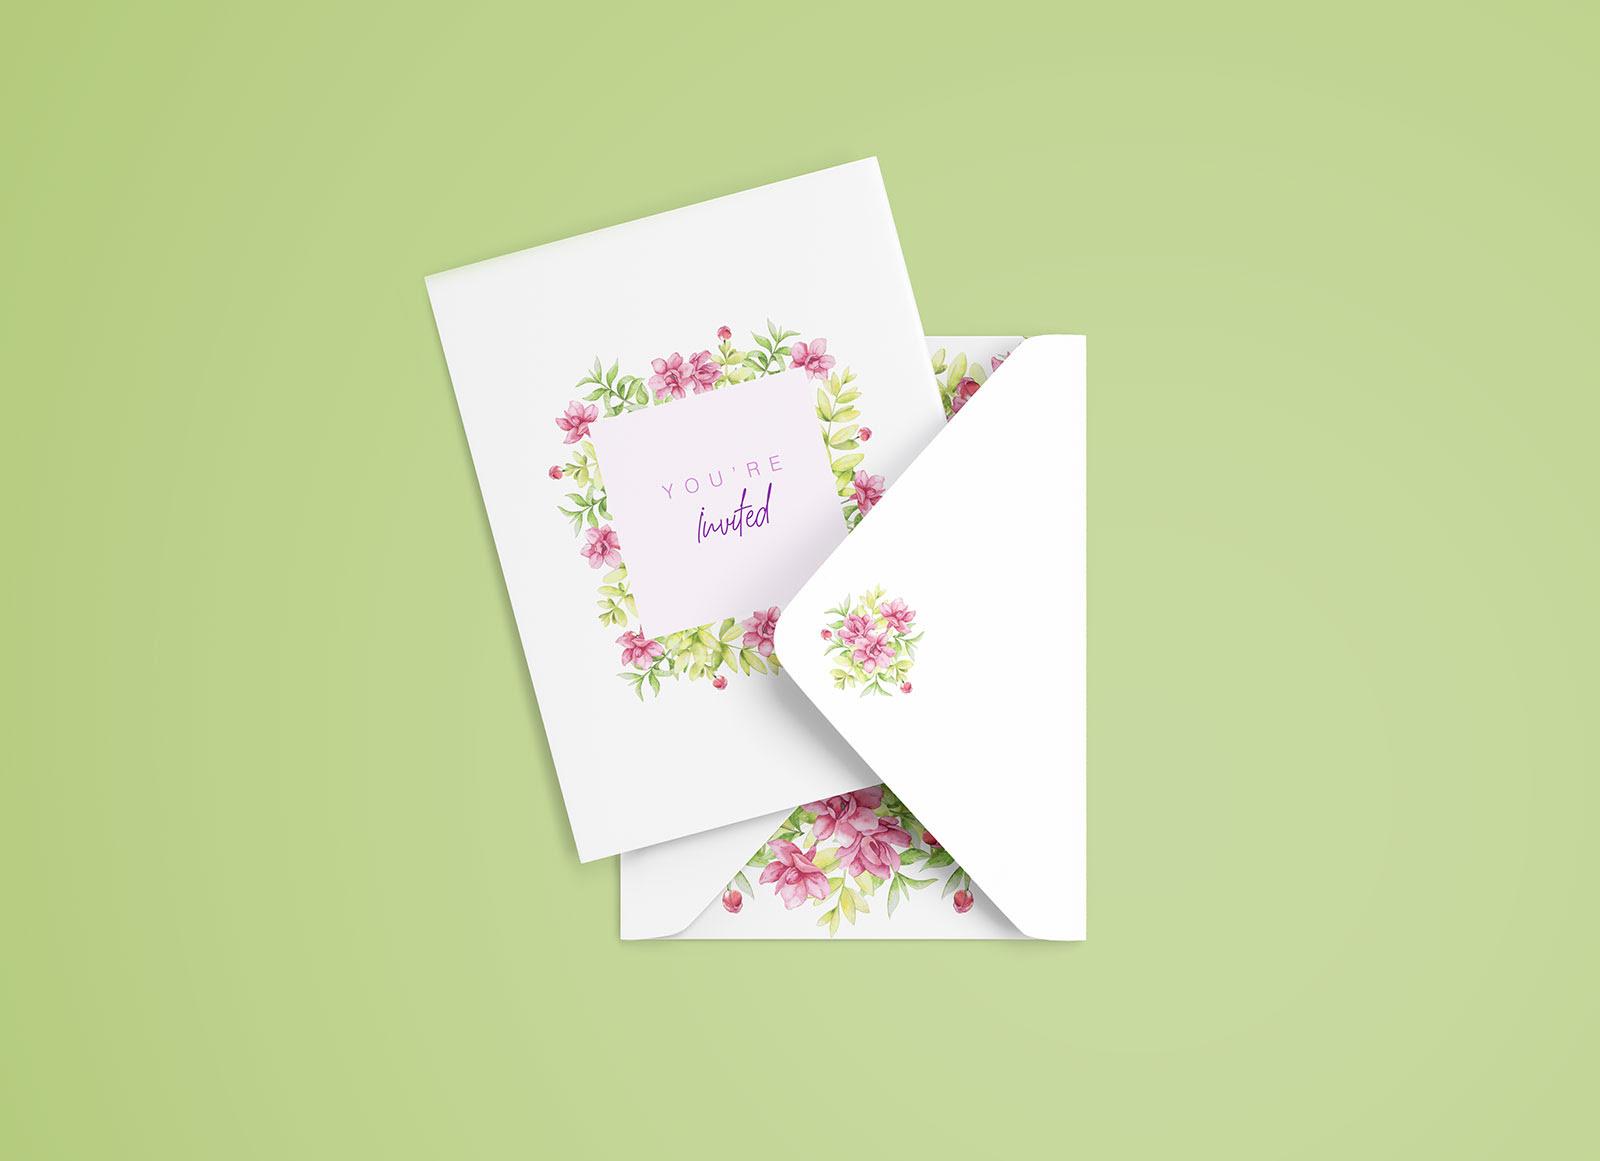 Download Free Simple Invitation Card Mockup PSD - Good Mockups